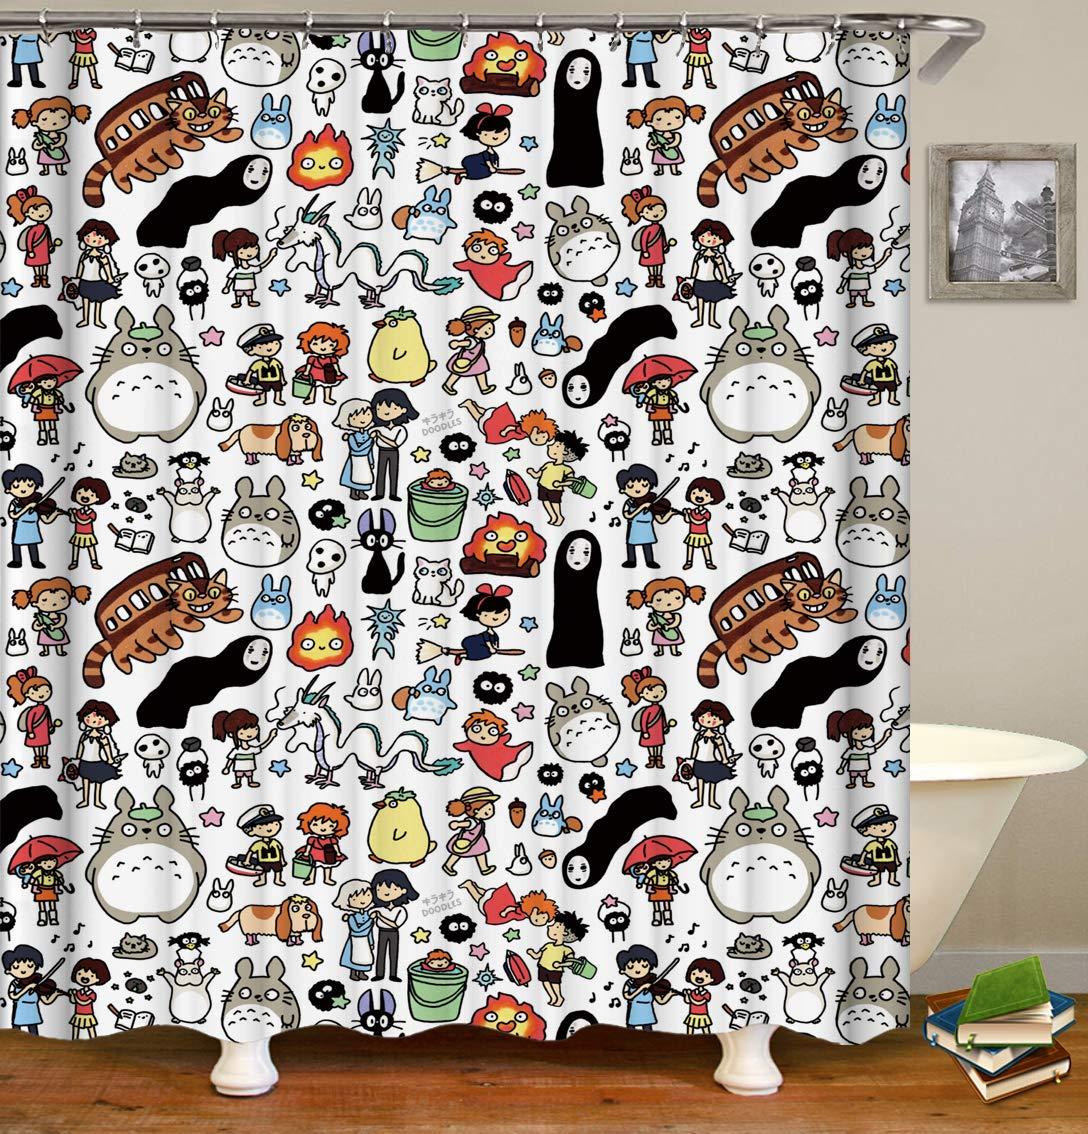 BARTORI Bathroom Decor Shower Curtain Totoro No Face Man Spirited Away Miyazaki Hayao Cartoon Theme Waterproof Polyester Fabric Bath Curtain with 12pcs Hooks 71''X71''